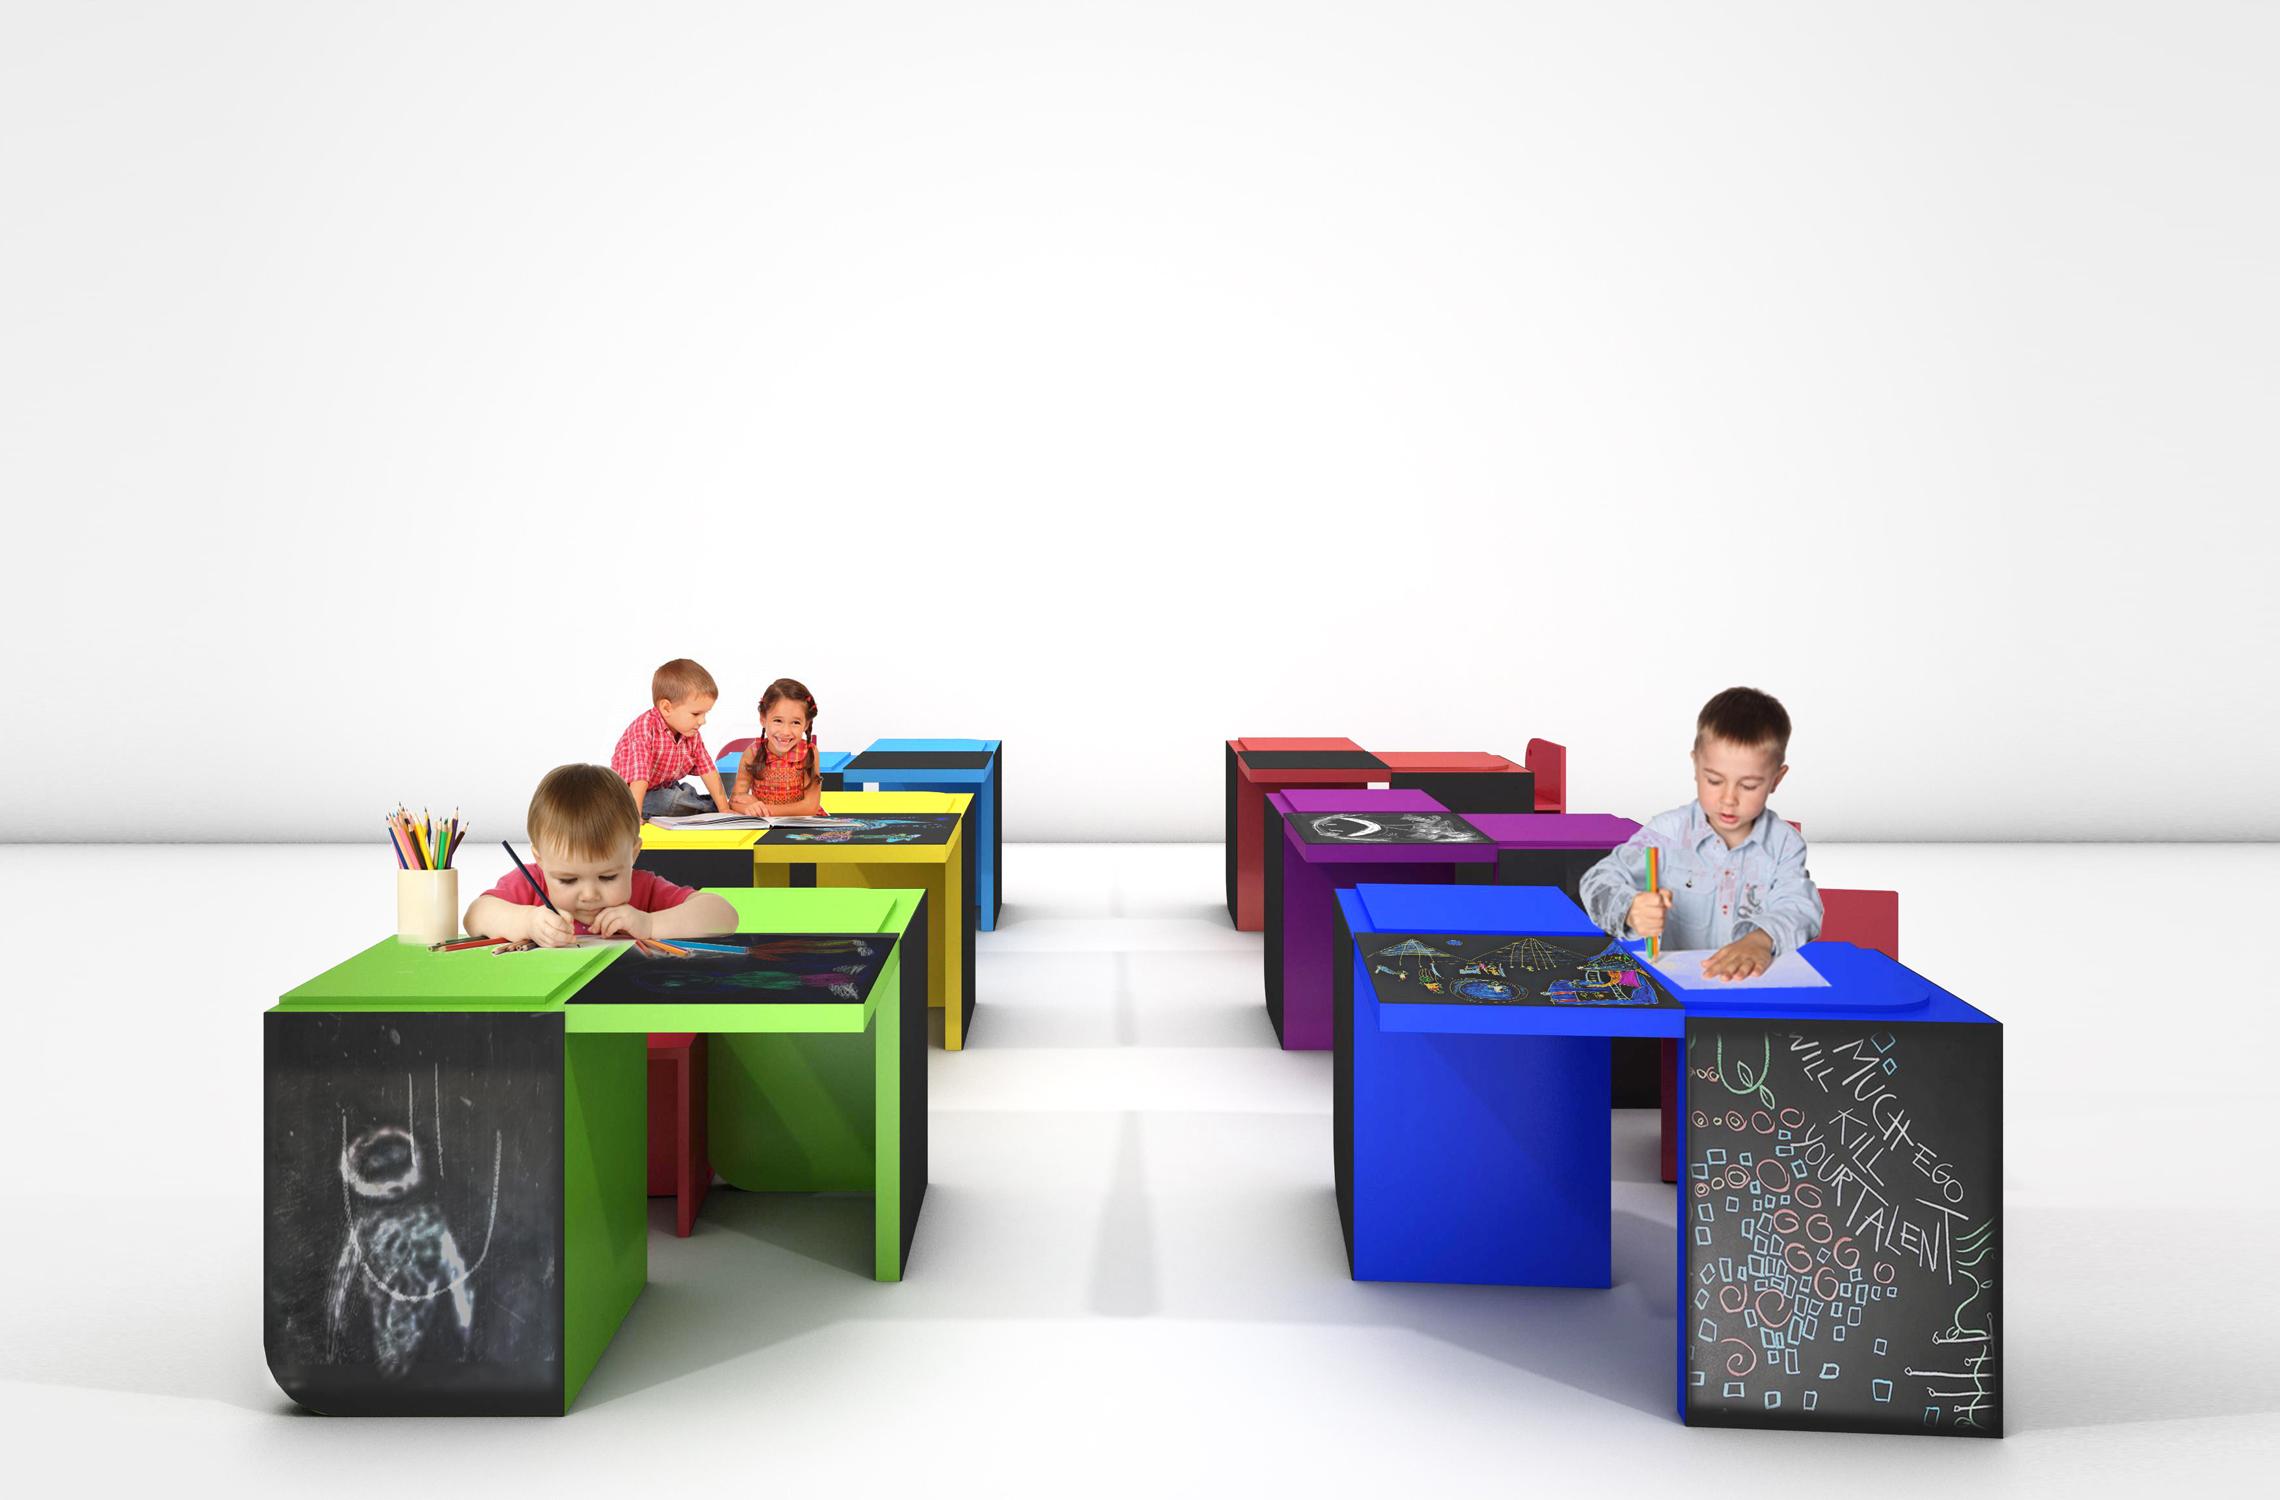 Muebles para preescolar imagui for Muebles para preescolar